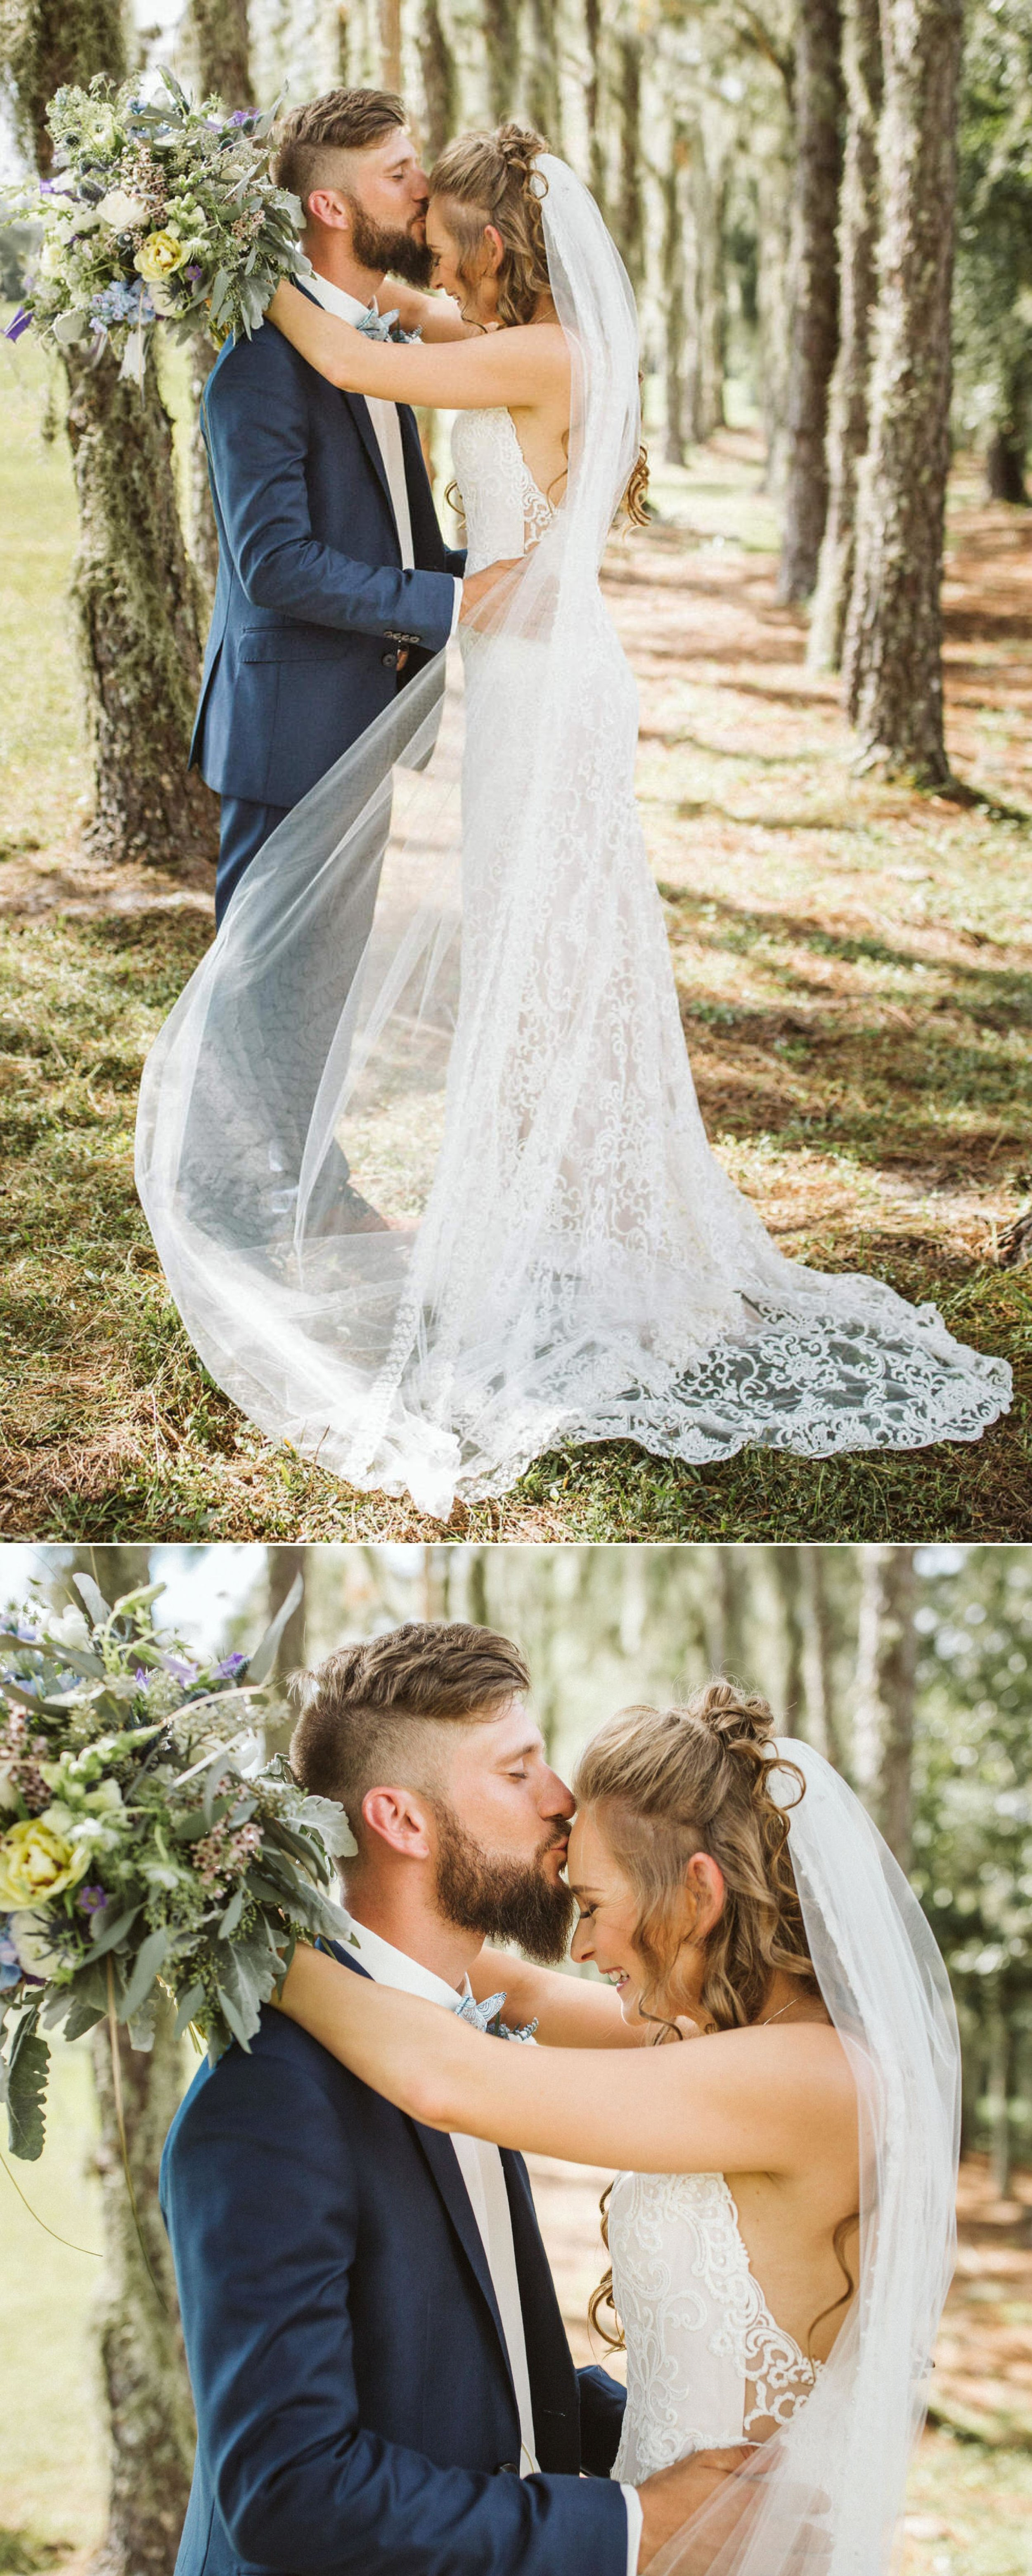 Romantic Floral Outdoor Field Chapel Wedding- Sarasota Florida- Courtney & Isaac9.jpg